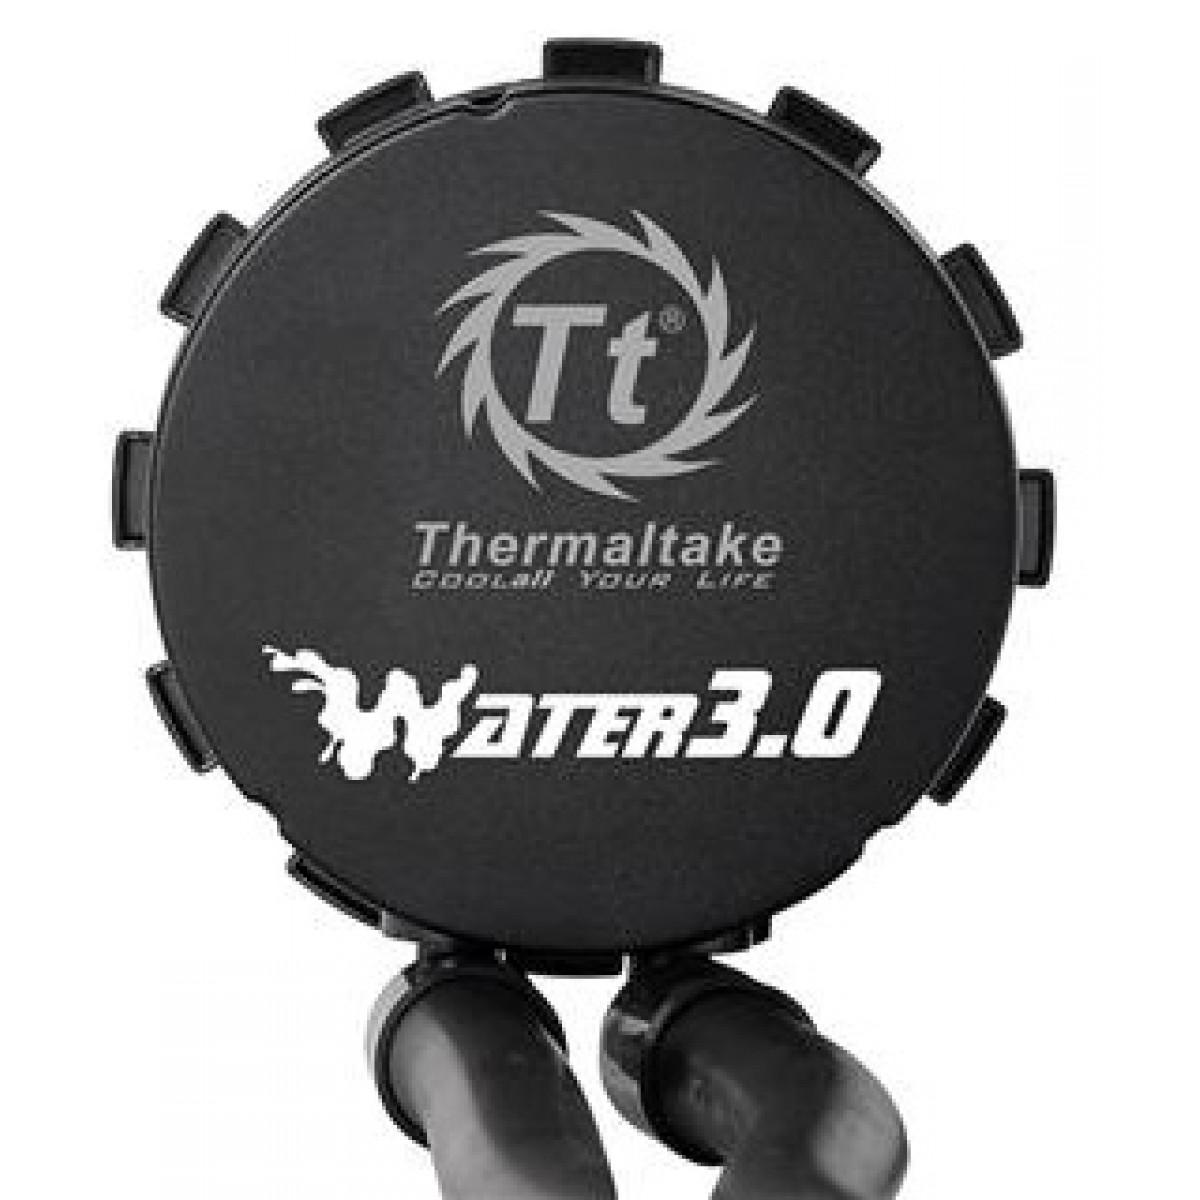 Watercooler Thermaltake Water 3.0 Performer C - CLW0222-B